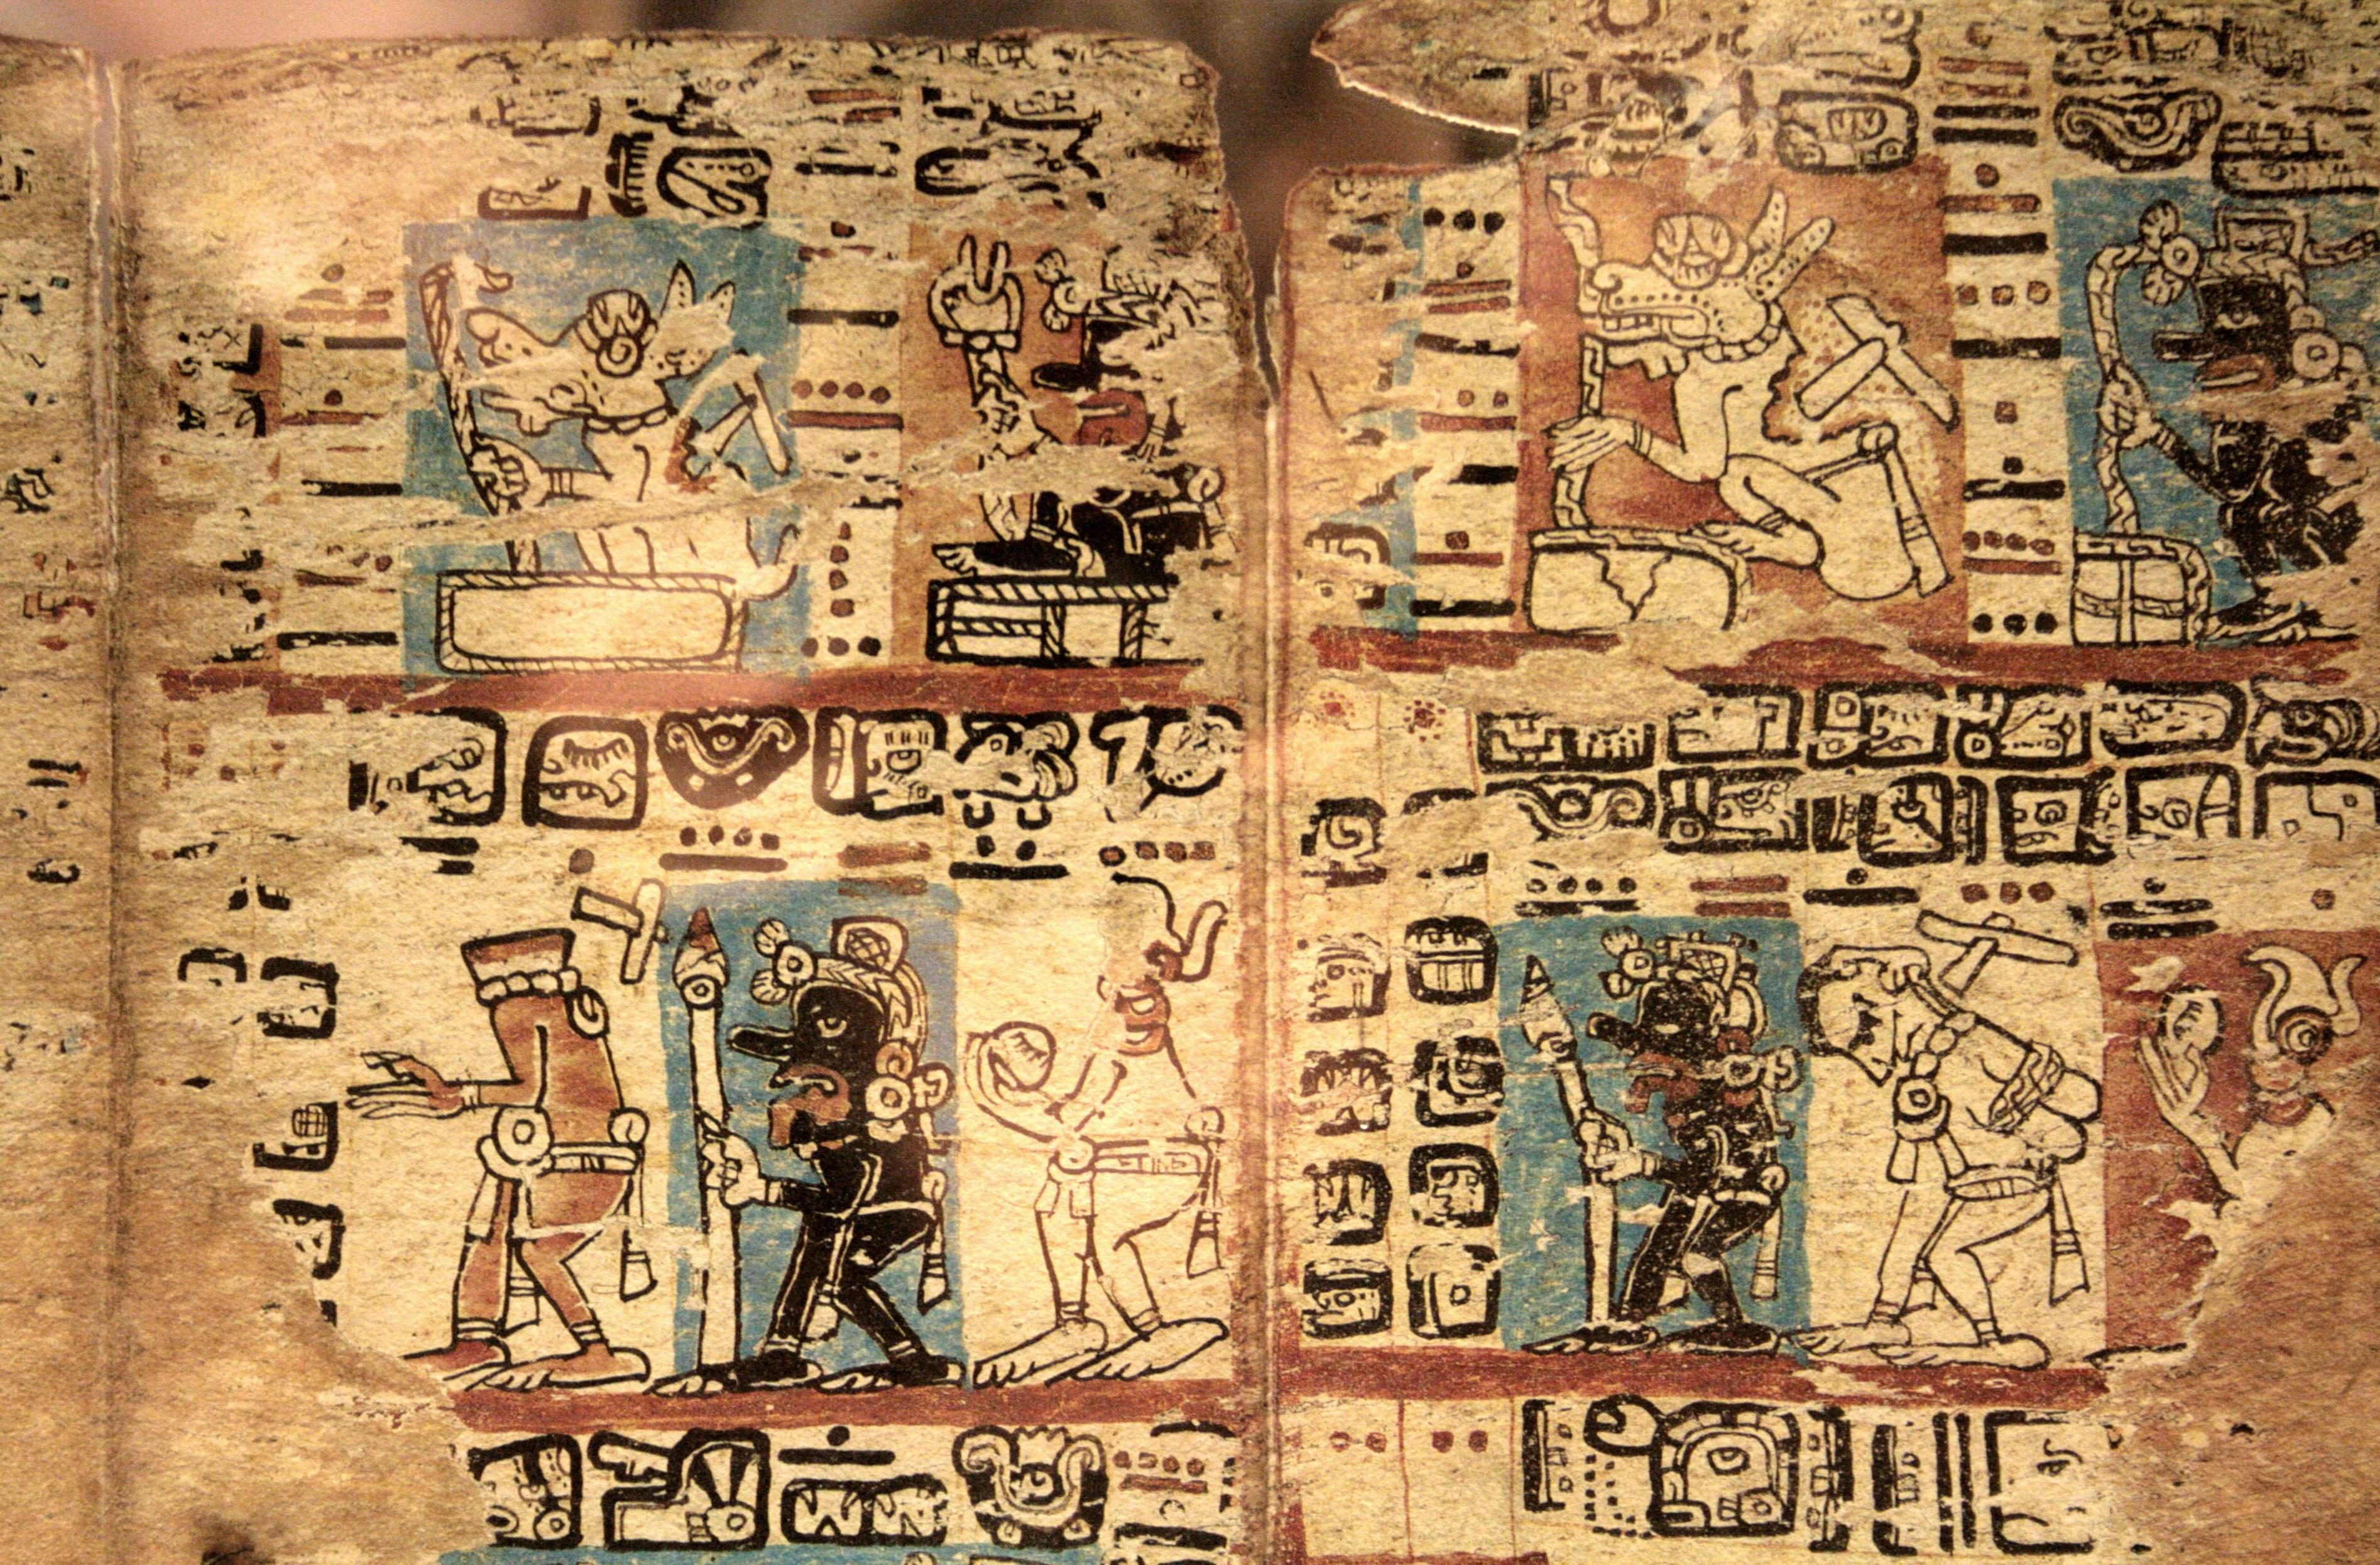 File:Museo de America Madrid Codex 01.jpg - Wikimedia Commons